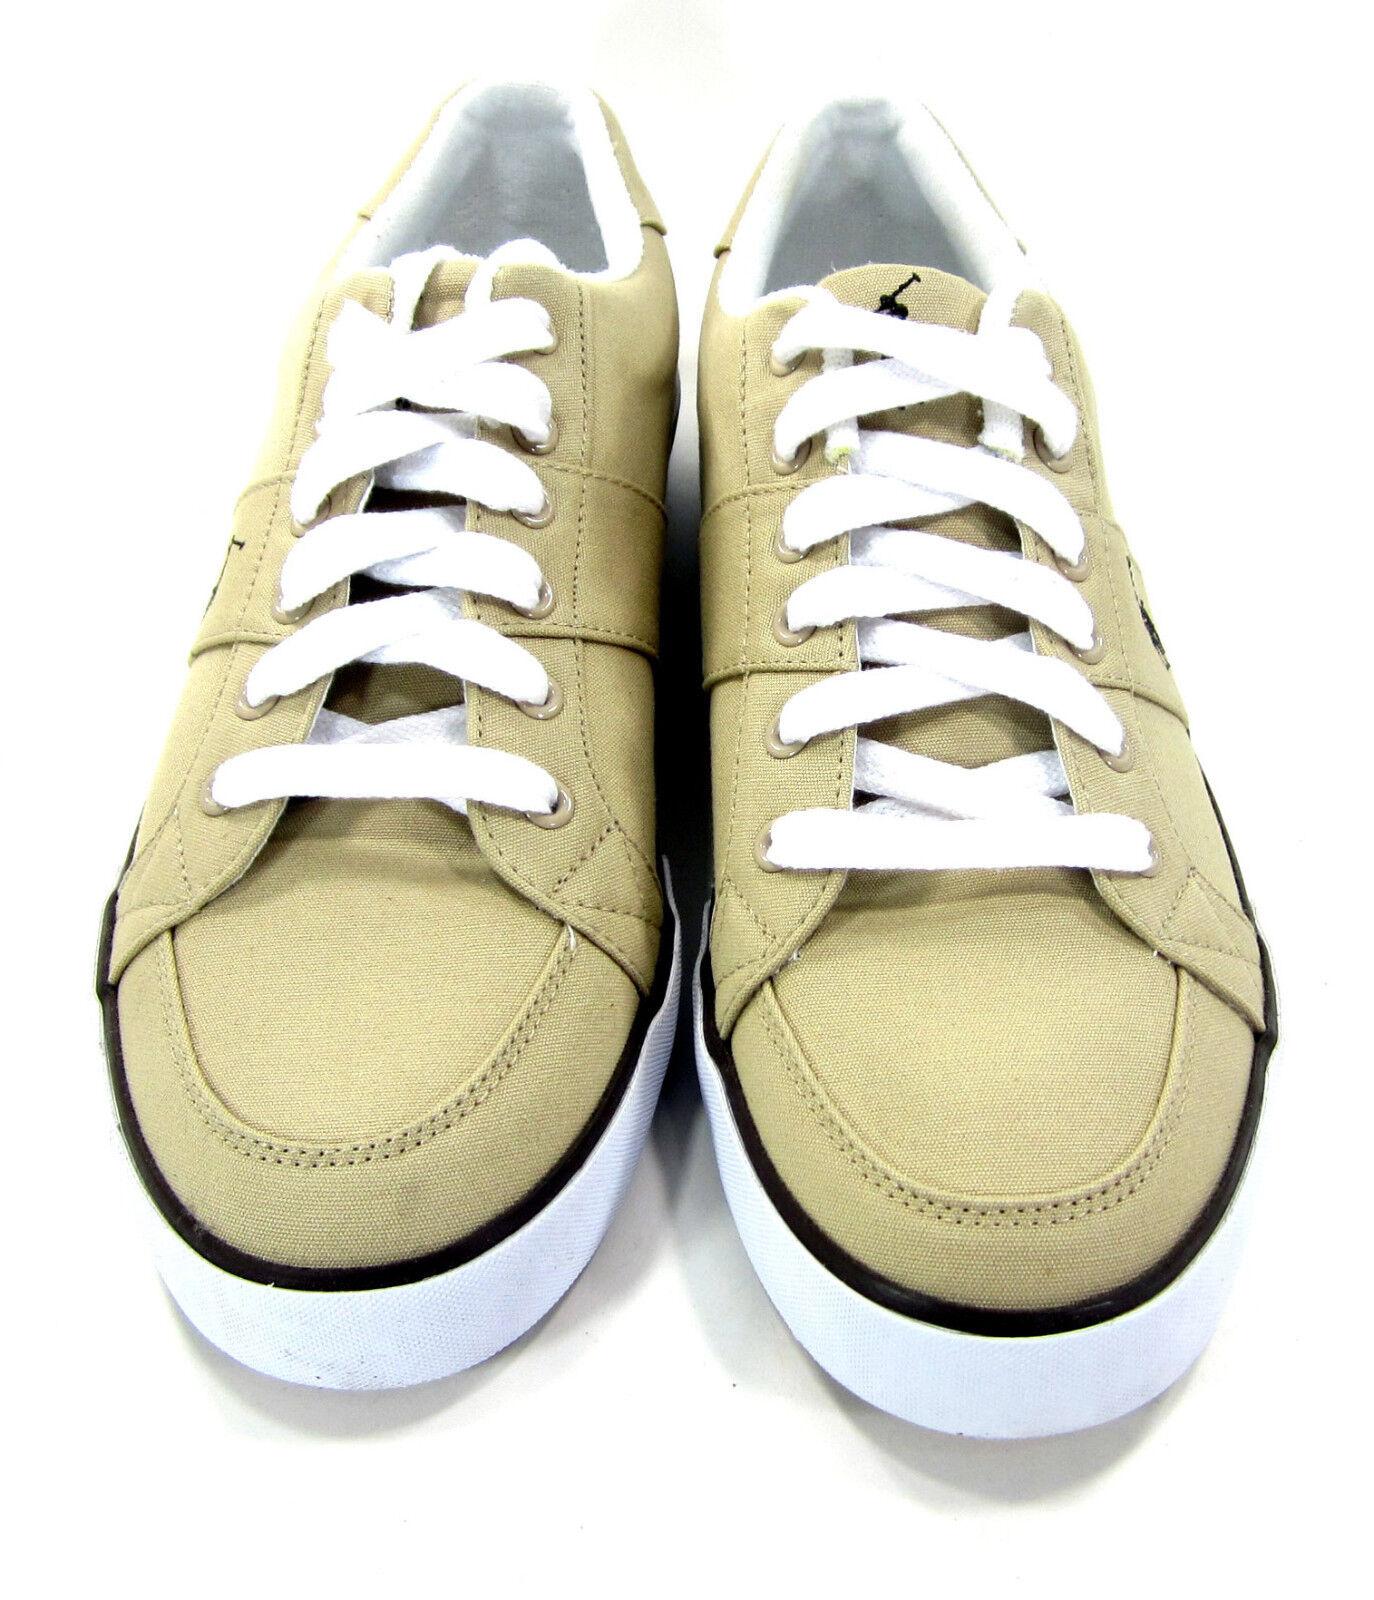 Polo Ralph Lauren Schuhes Harold Größe Canvas Khaki Tan Sneakers Größe Harold 12 a0cf3a